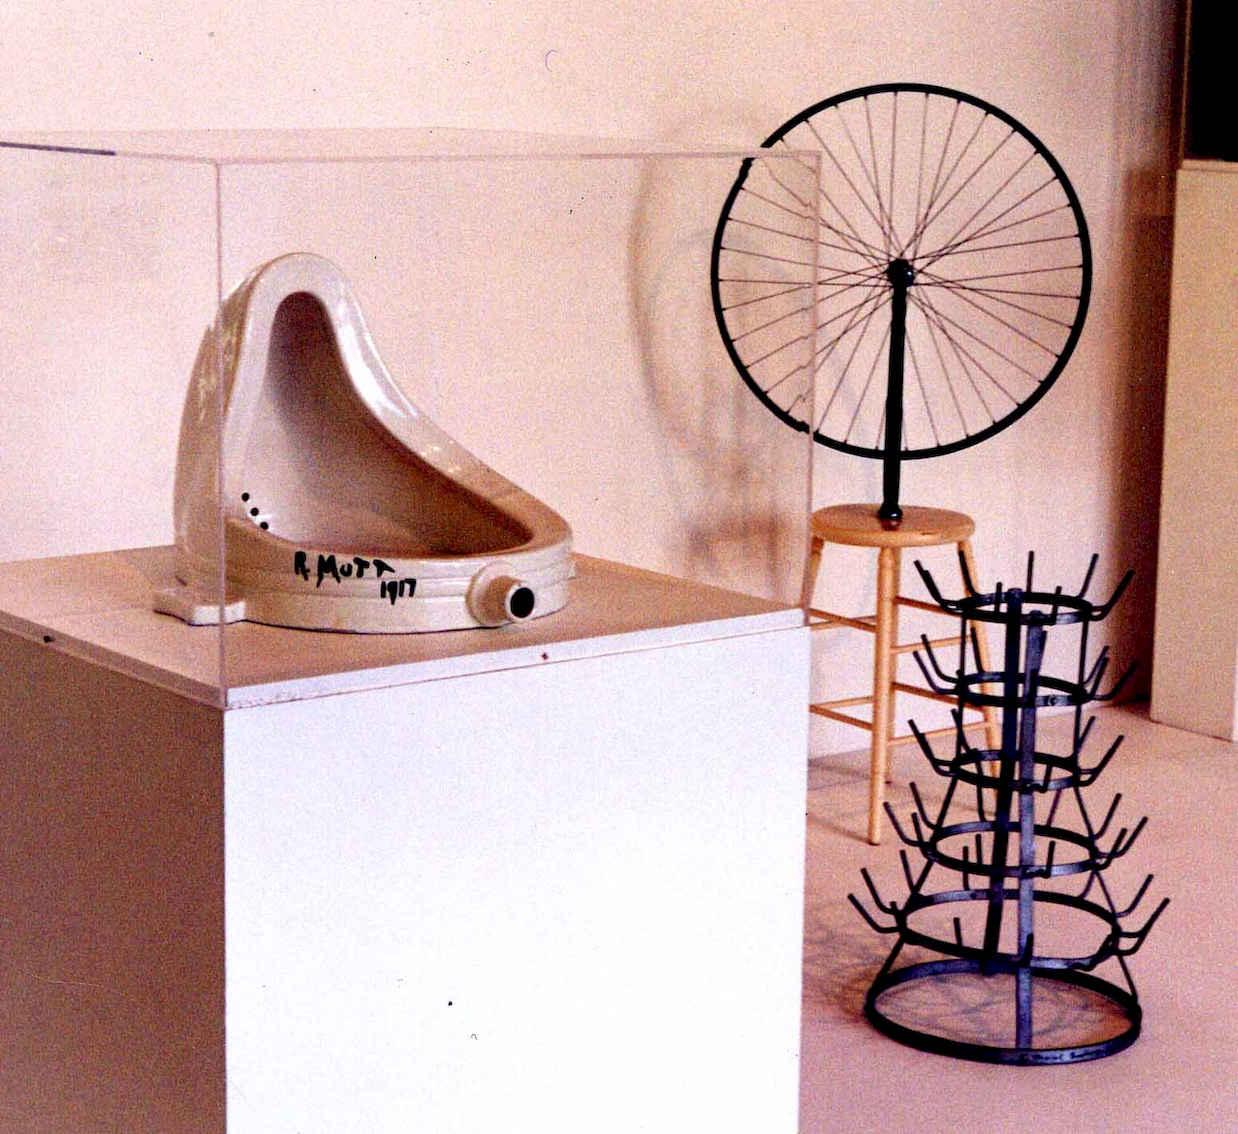 Objet deco insolite urinoir Marcel Duchamp